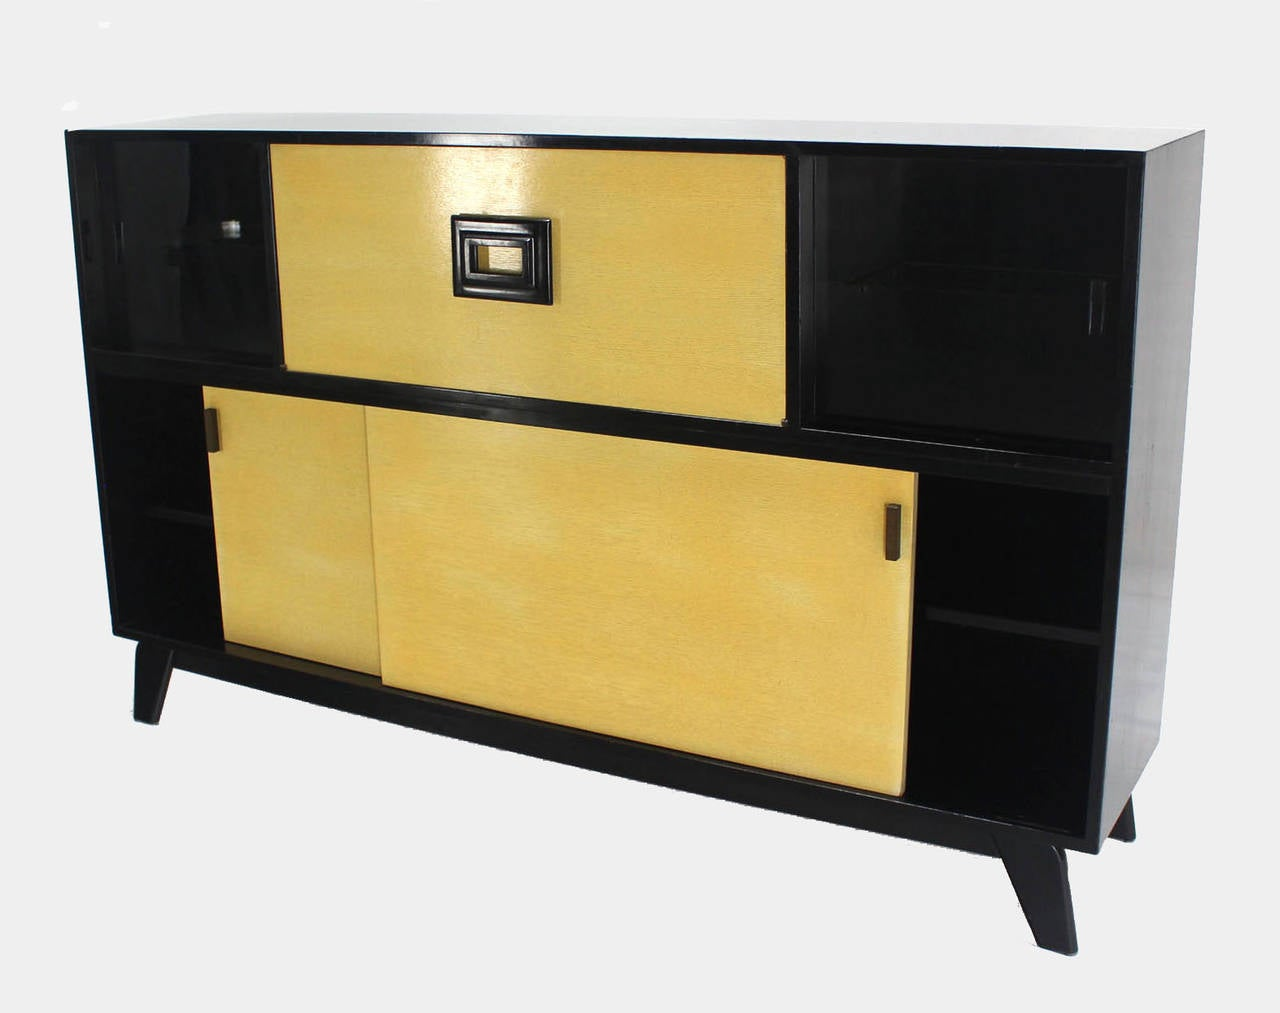 Lacquered Mid Century Modern Credenza Black Lacquer Gredenza Bar Liquor Cabinet For Sale